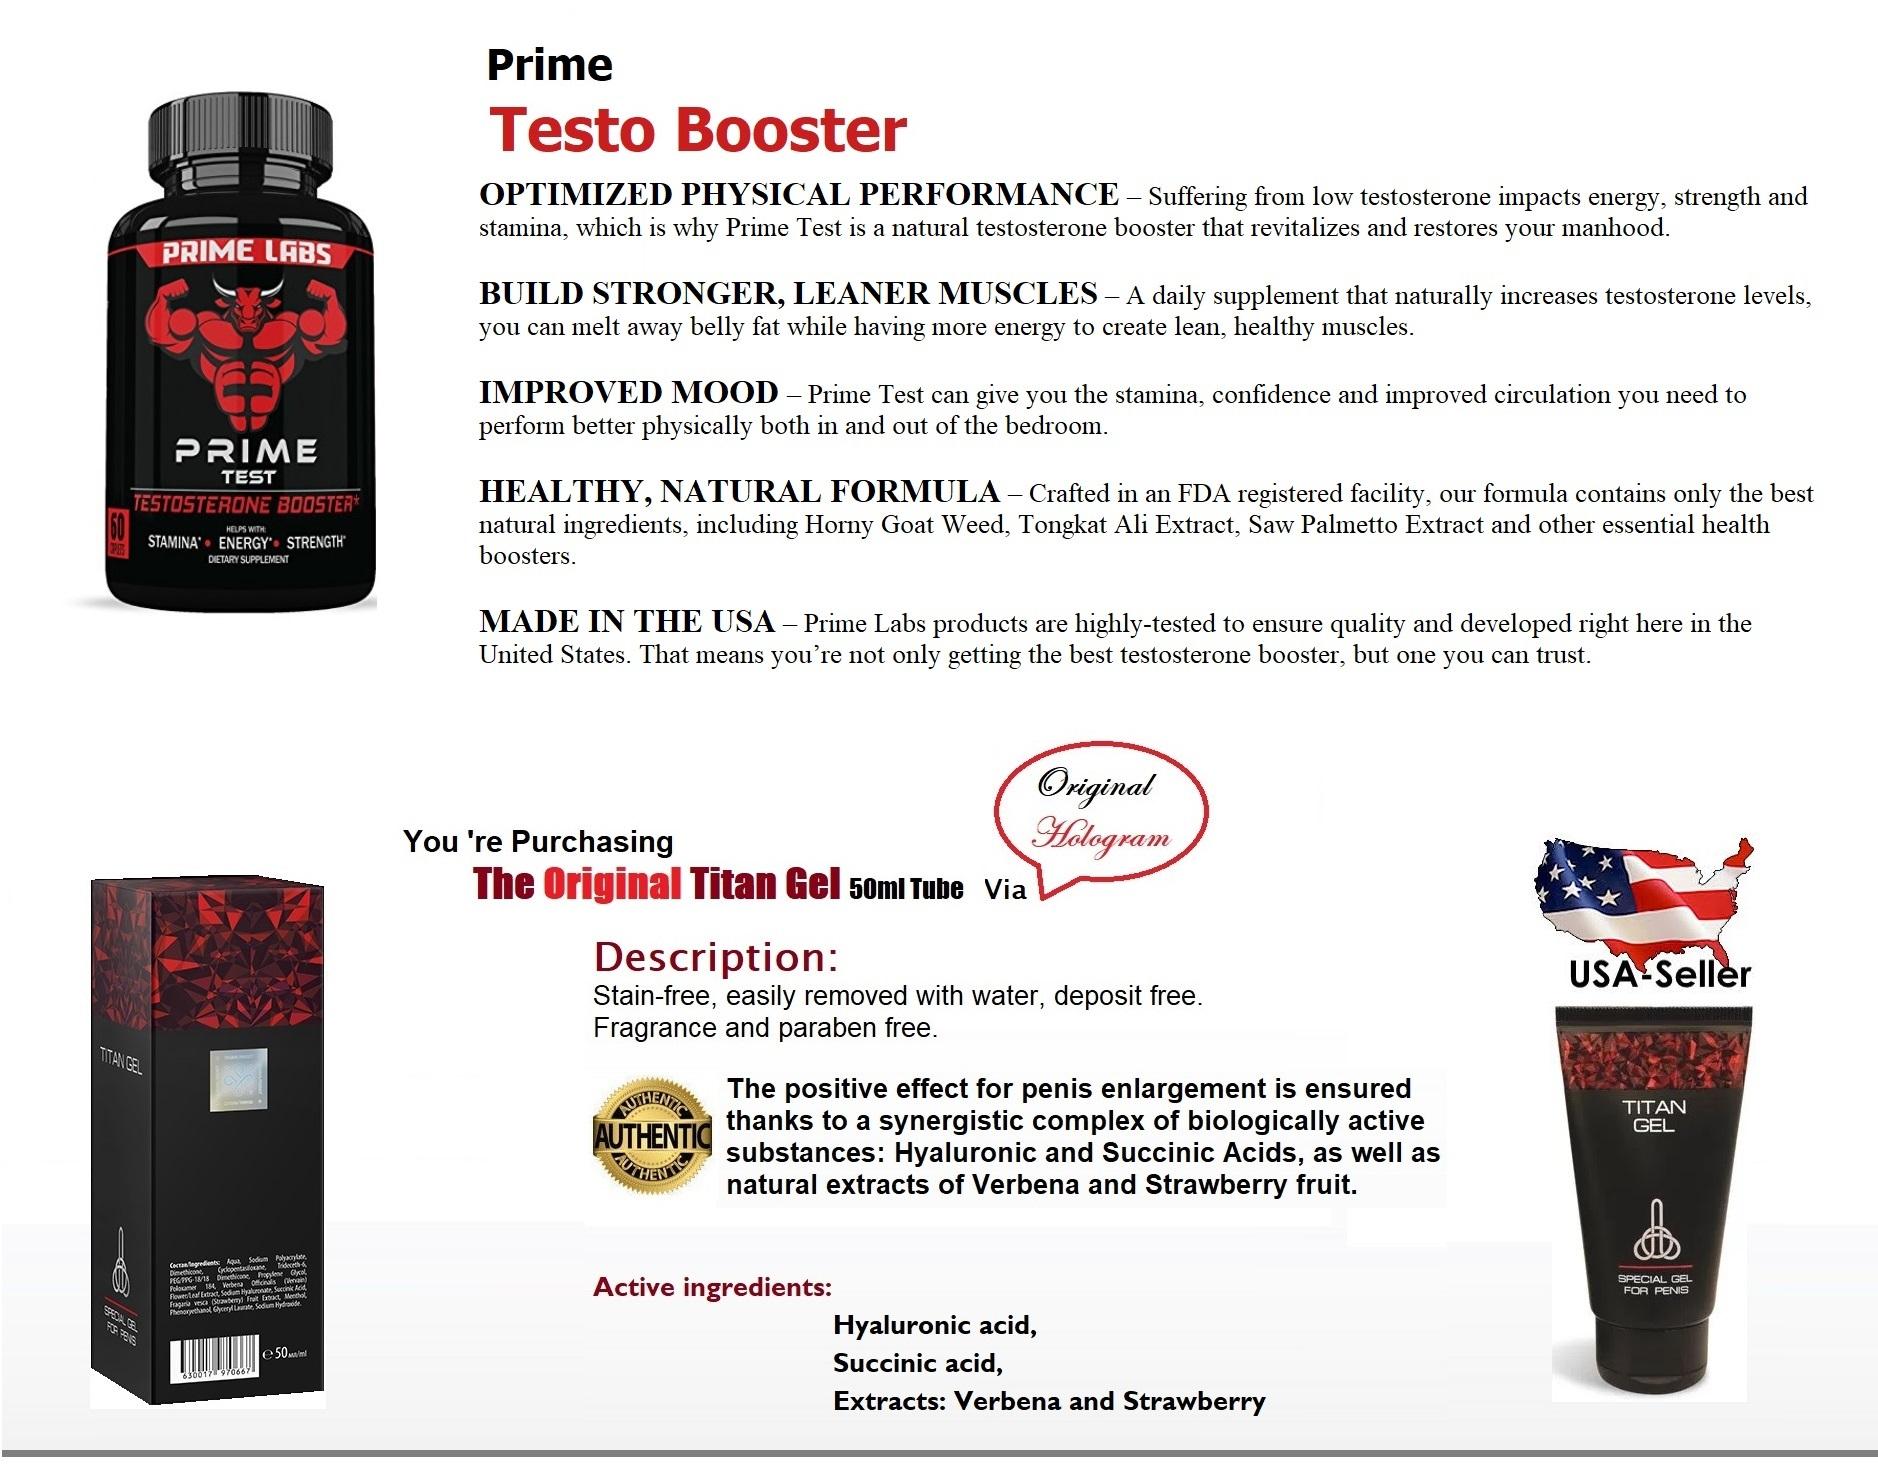 Prime Labs Men's Testosterone Booster (60 Caplets) + Original Titan Gel eBay